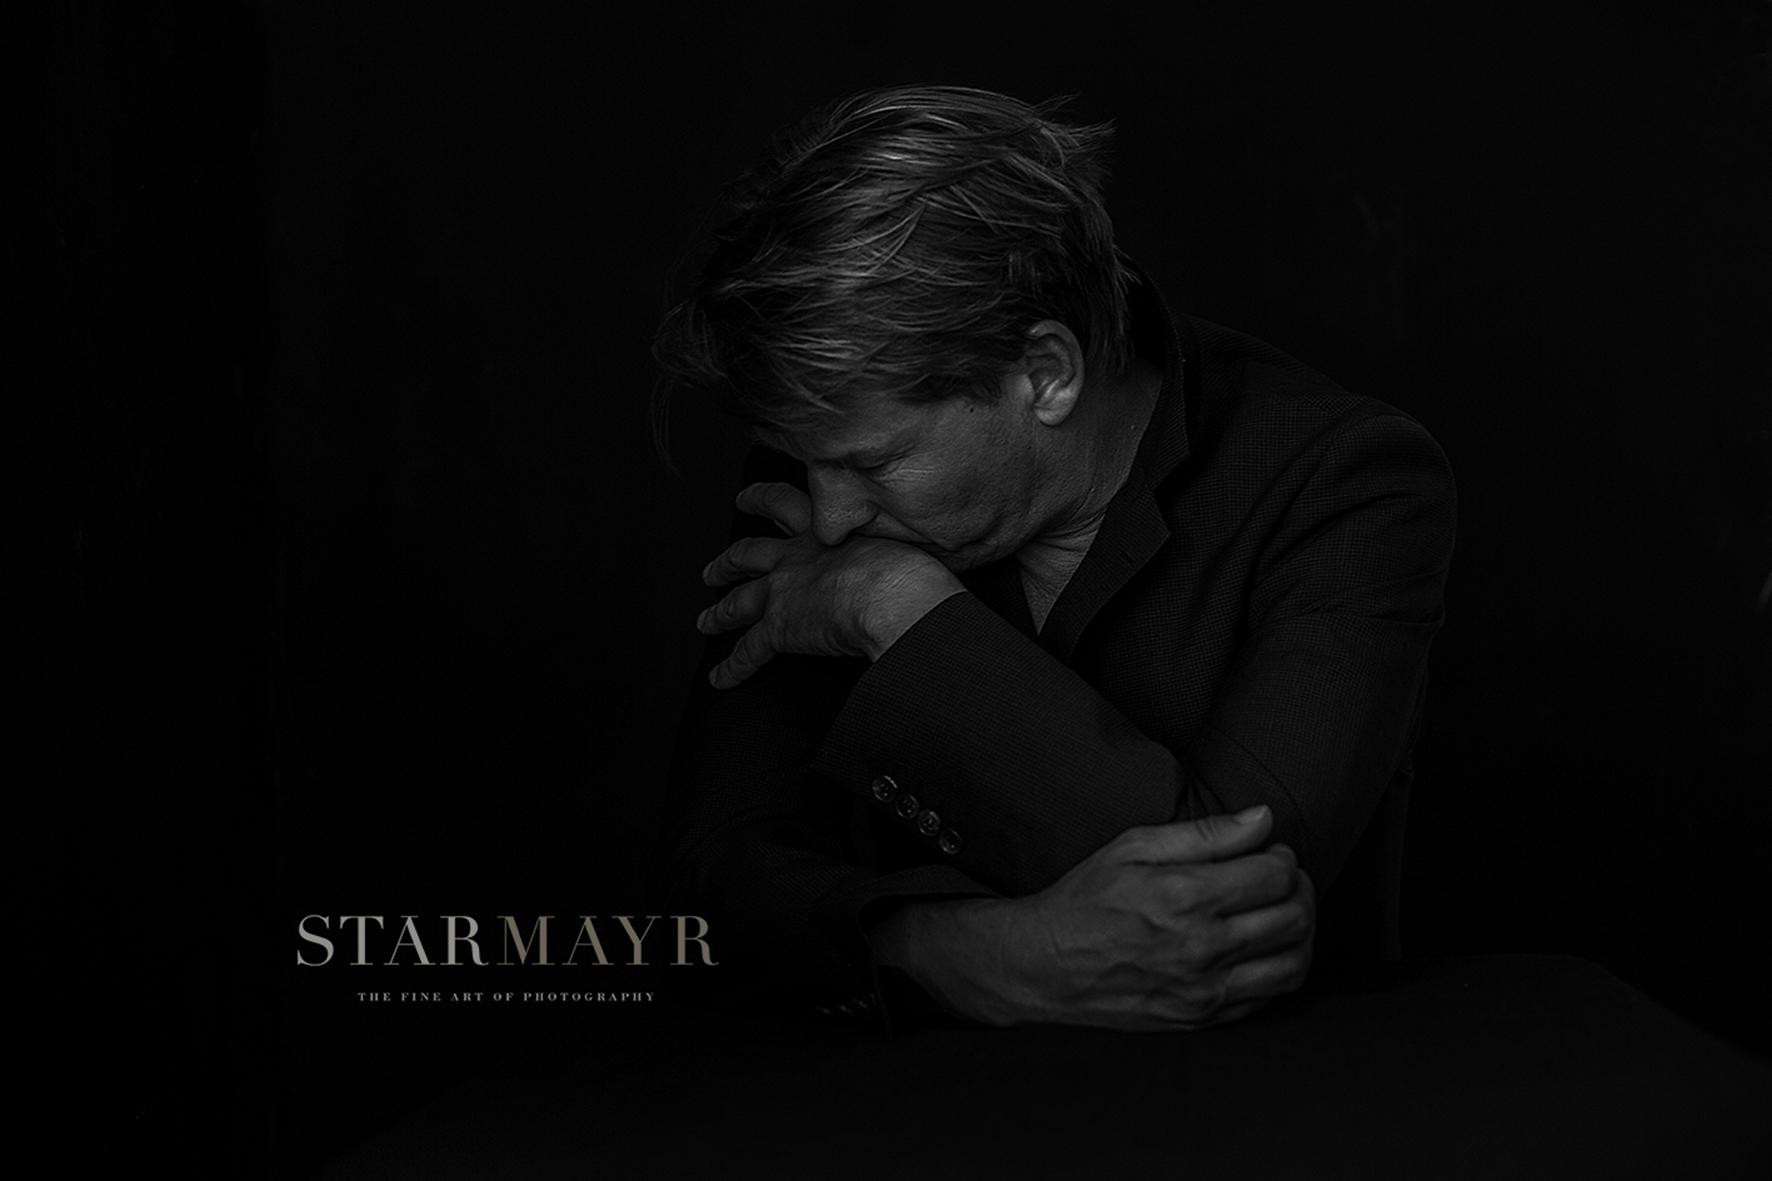 Starmayr, Serge Falck, Schauspieler, Business Portraits, Fotograf, Linz, Leonding, Sed Card 1,